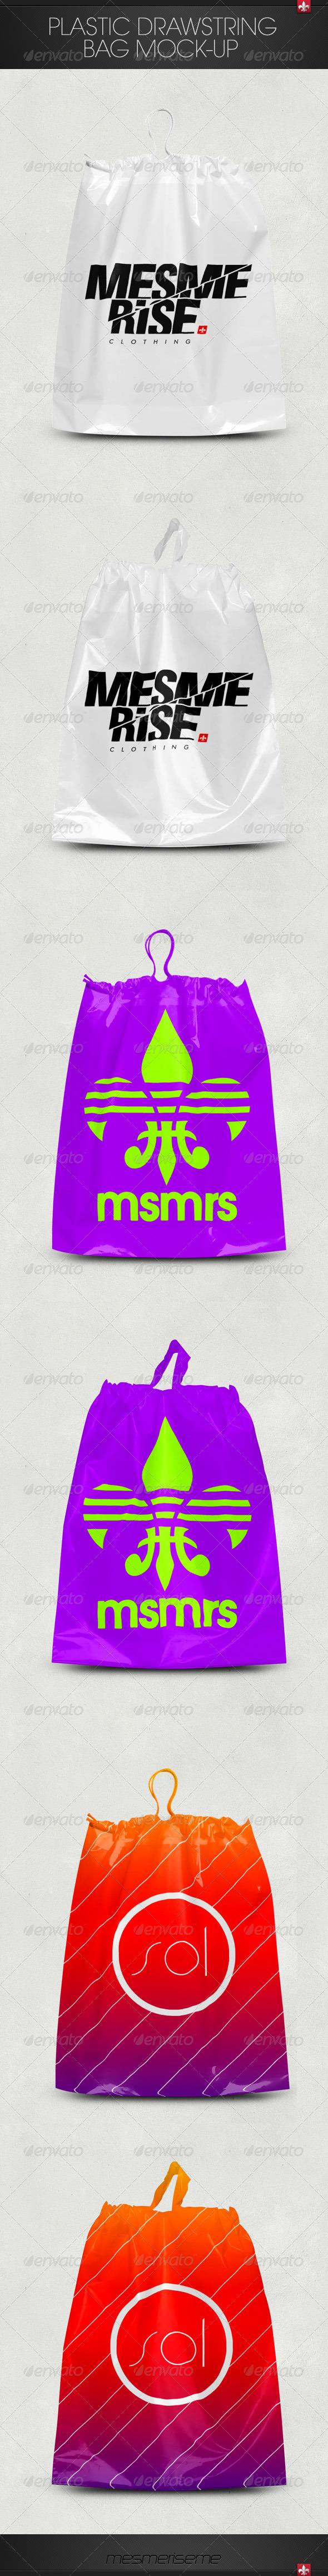 GraphicRiver Plastic Drawstring Bag Mock-up 7407538